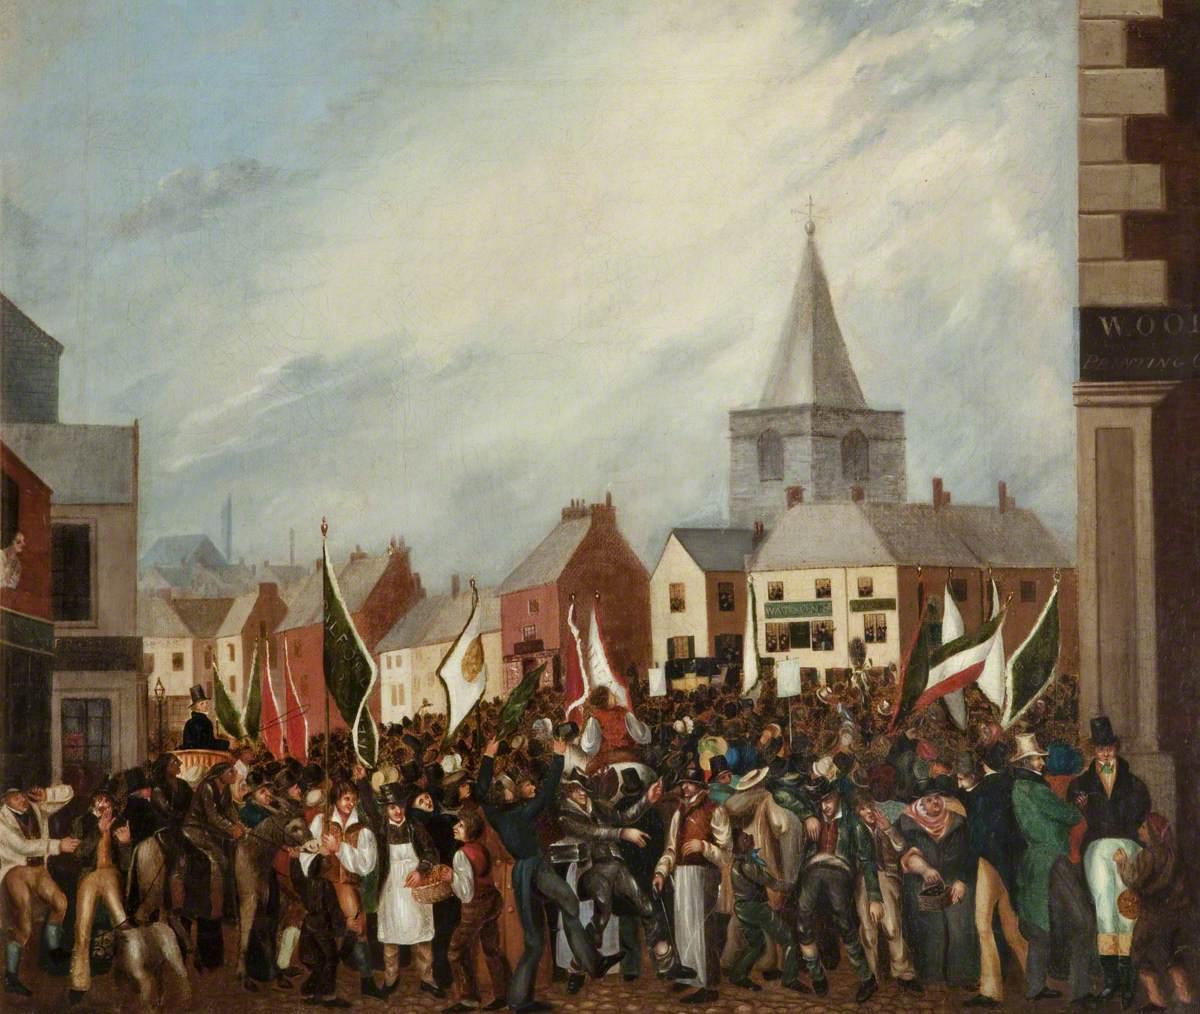 unknown artist; The 1832 Blackburn Election